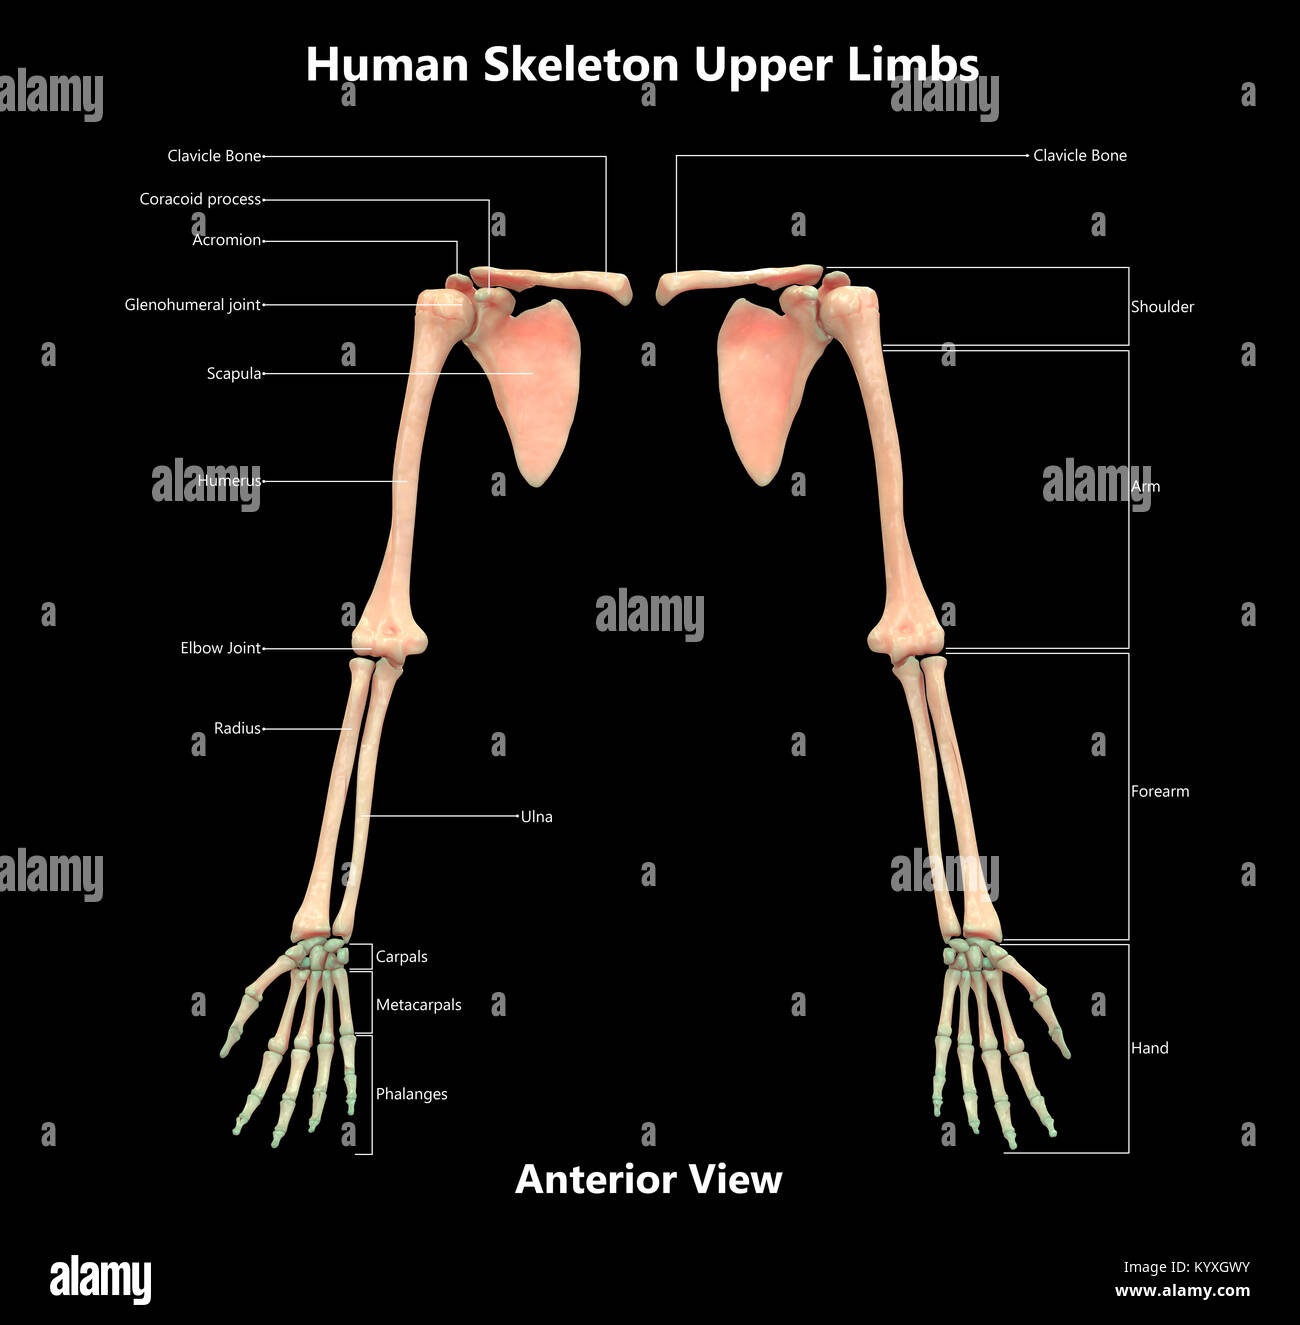 hight resolution of human skeleton system upper limbs label design anterior view anatomy